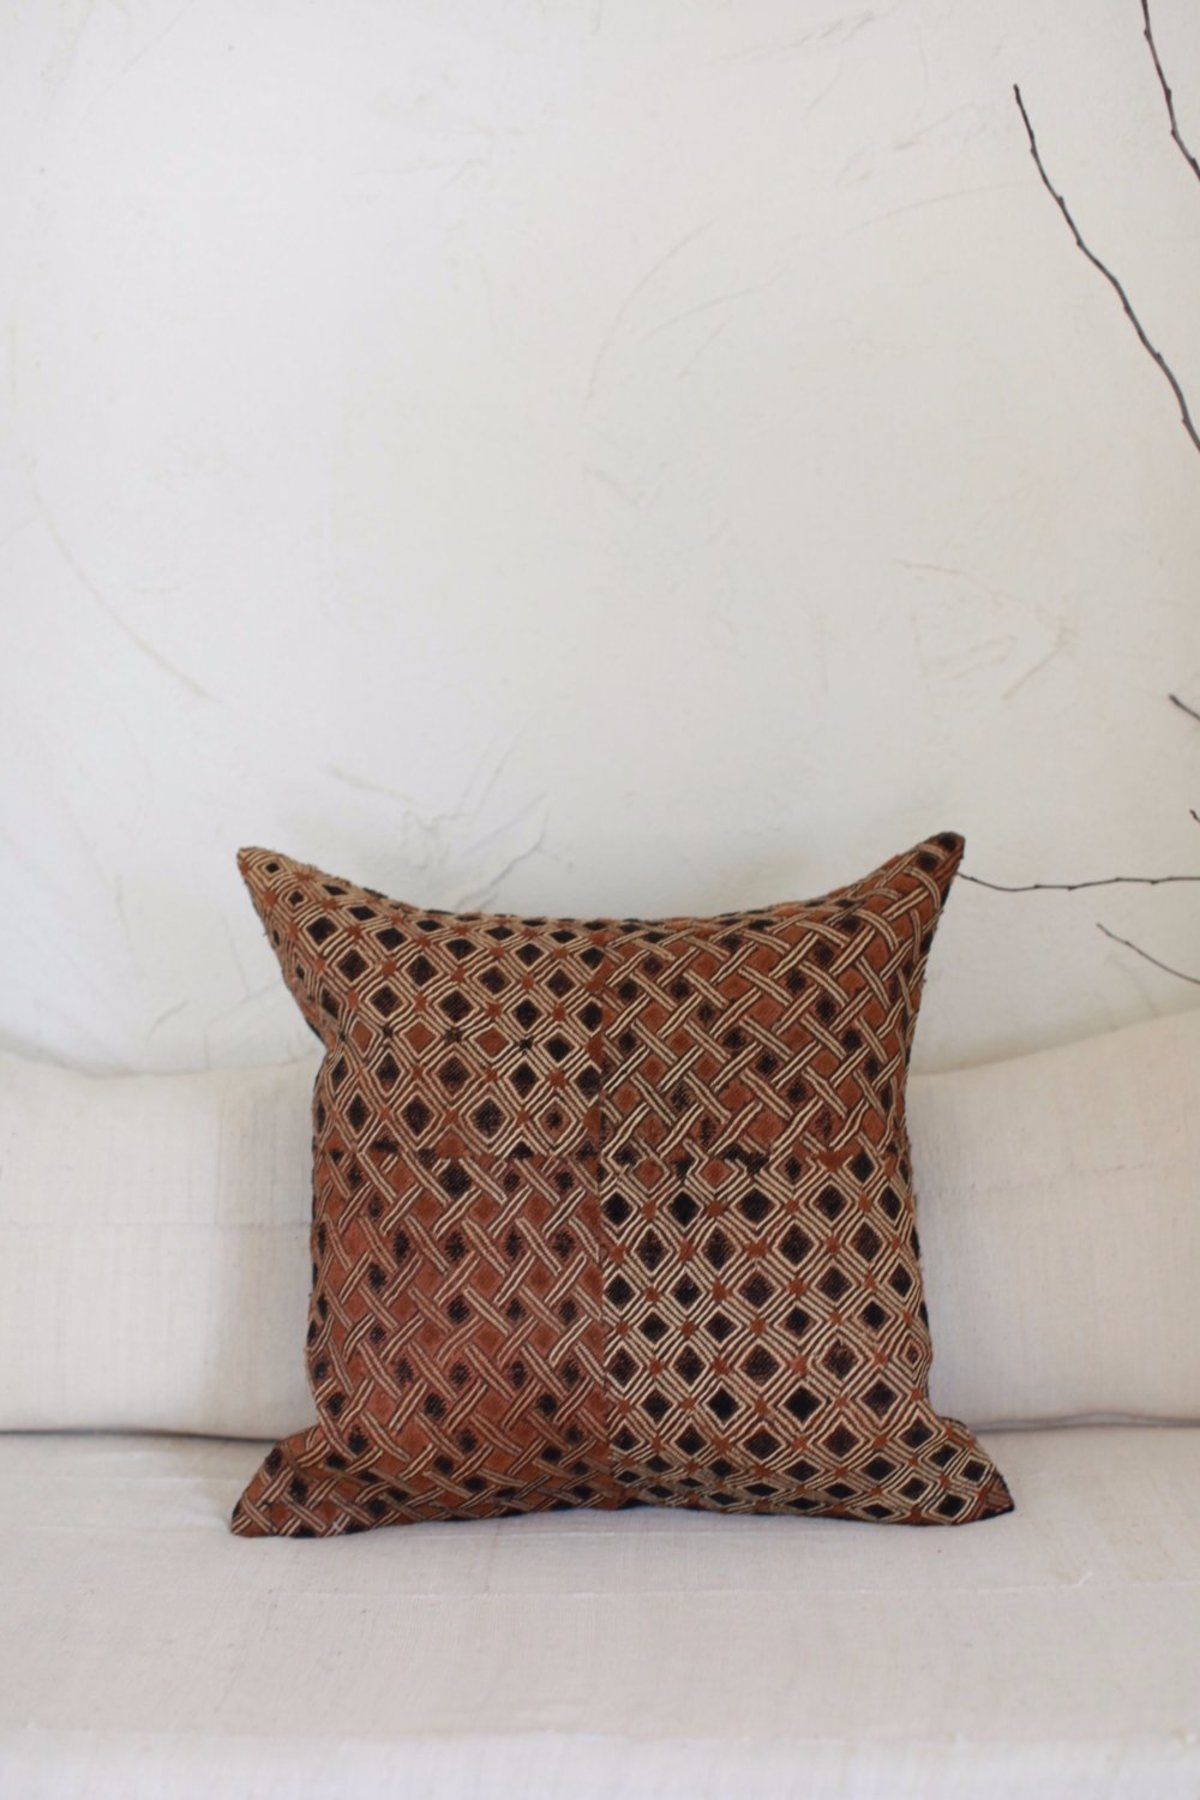 nomad collective kuba cloth pillow brown black natural